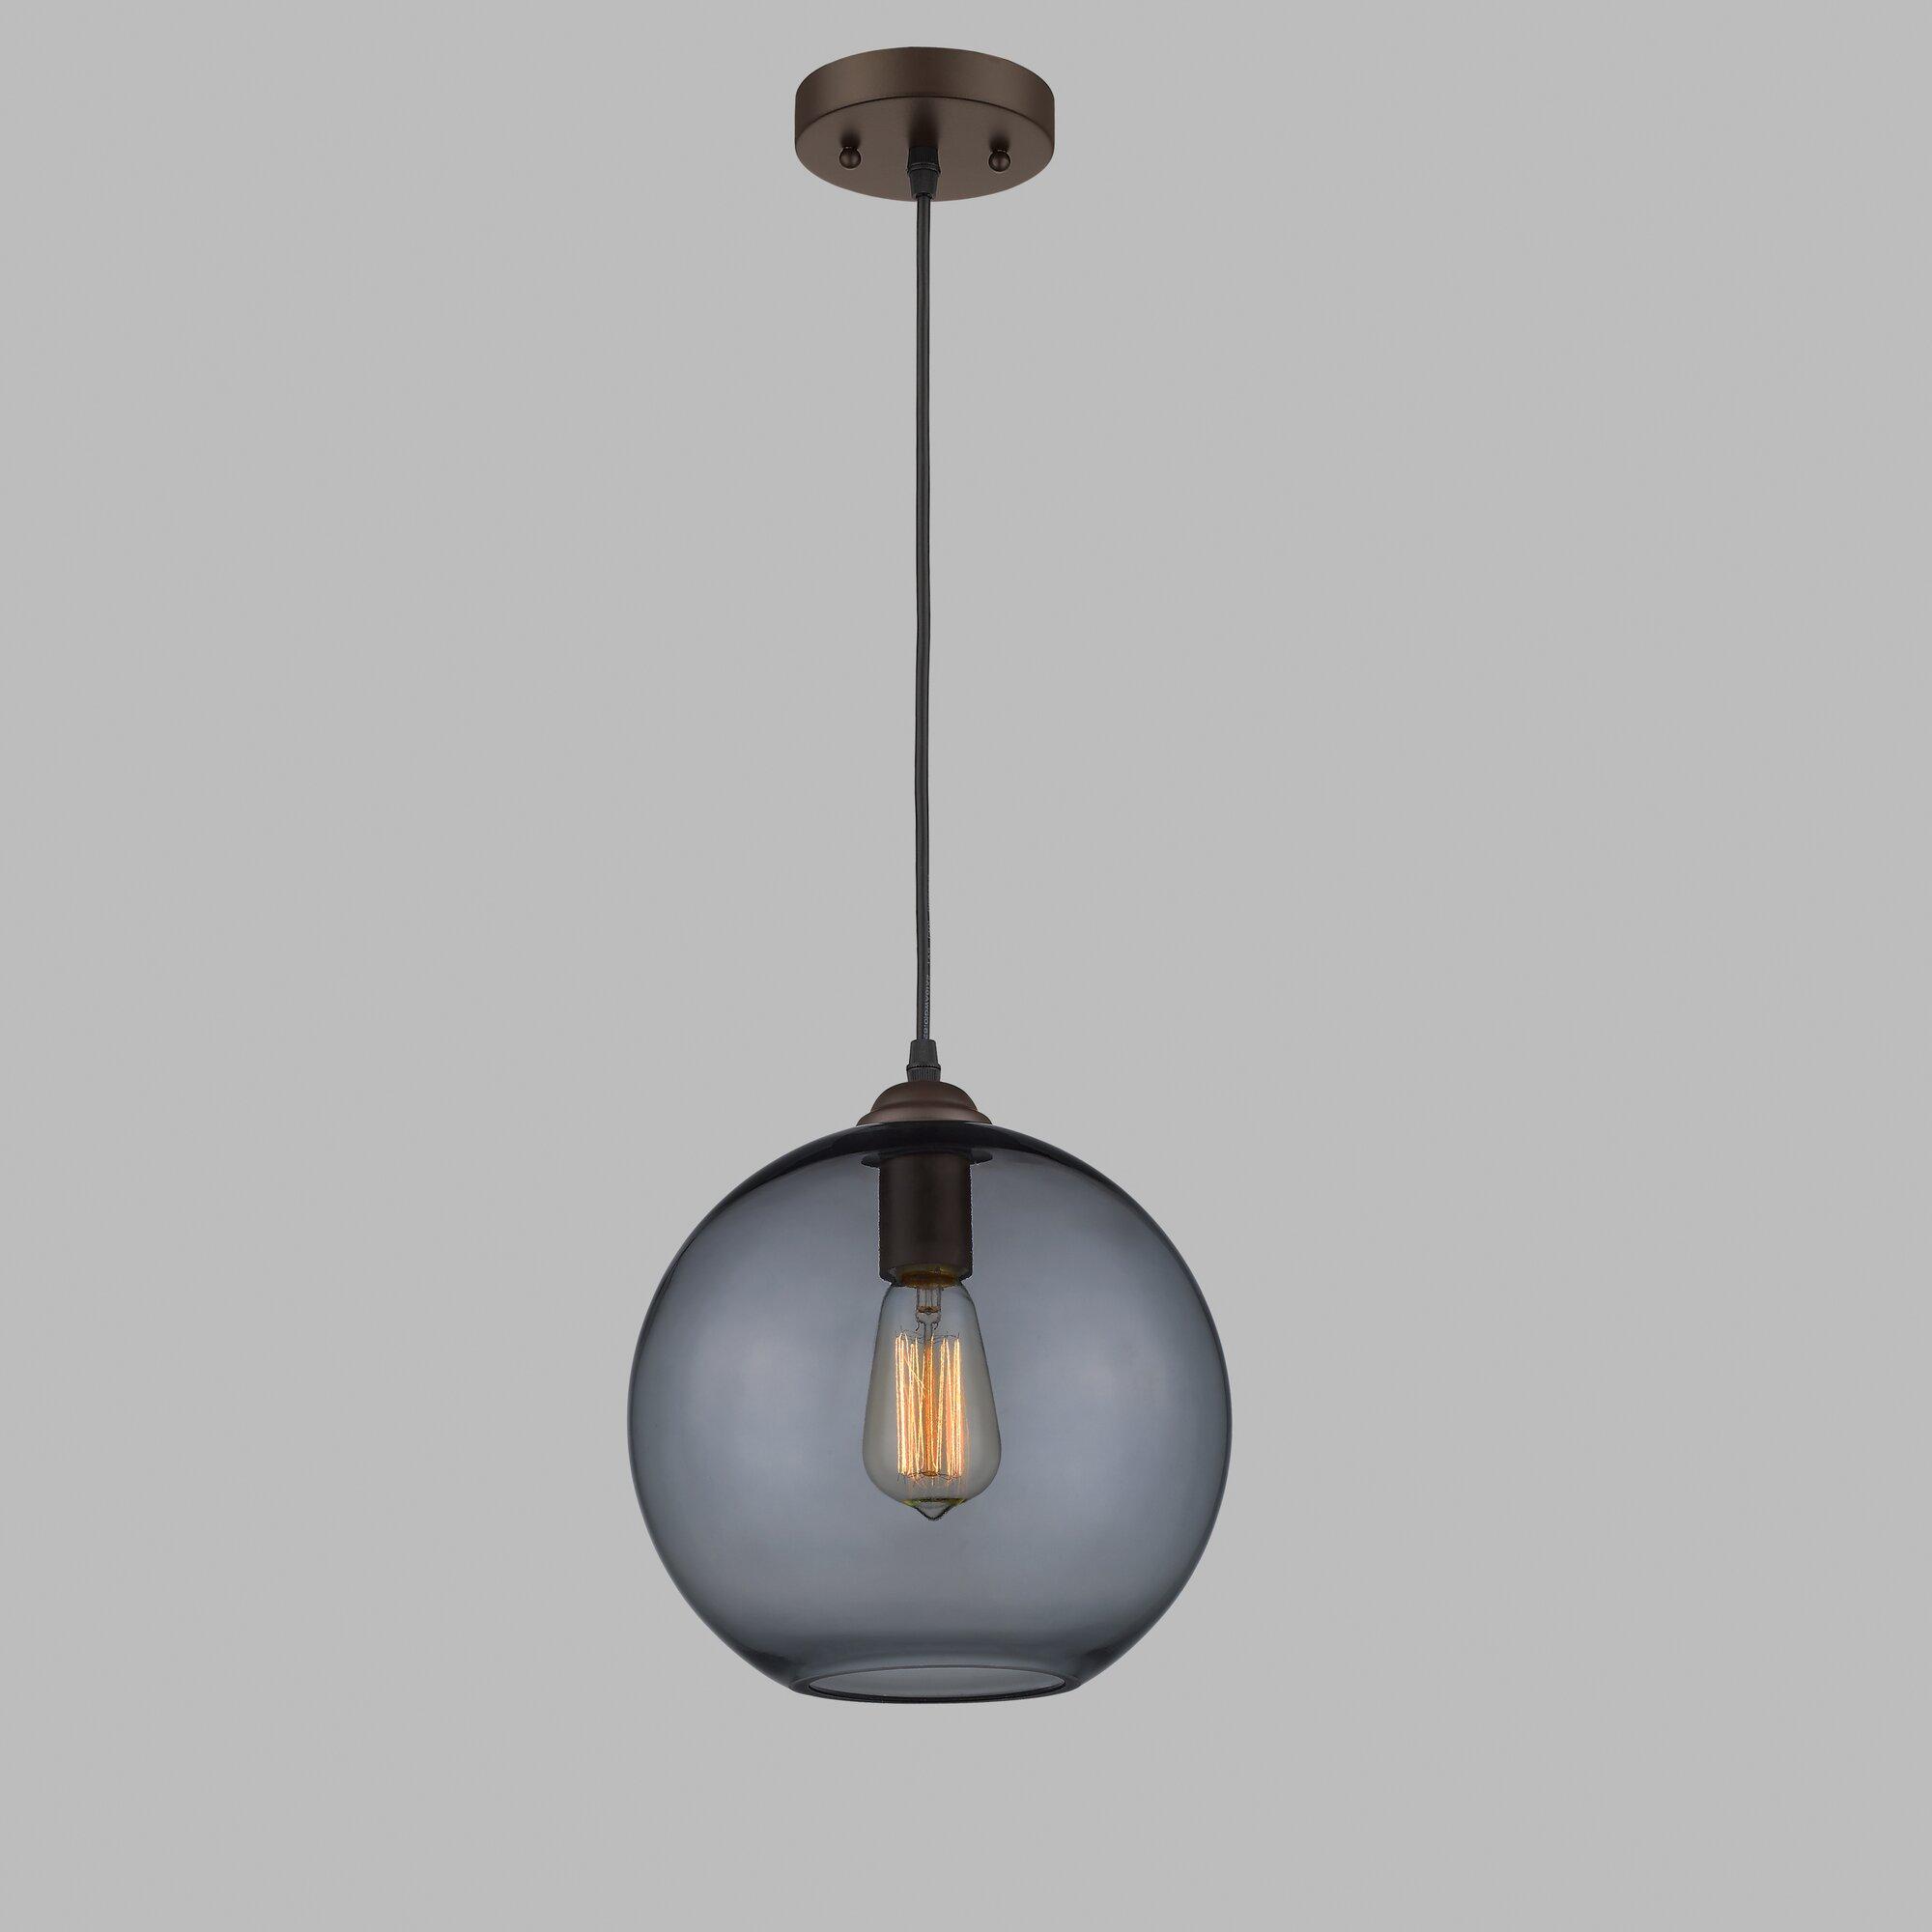 Laurel Foundry Modern Farmhouse™ Bouvet 1-Light Globe Mini